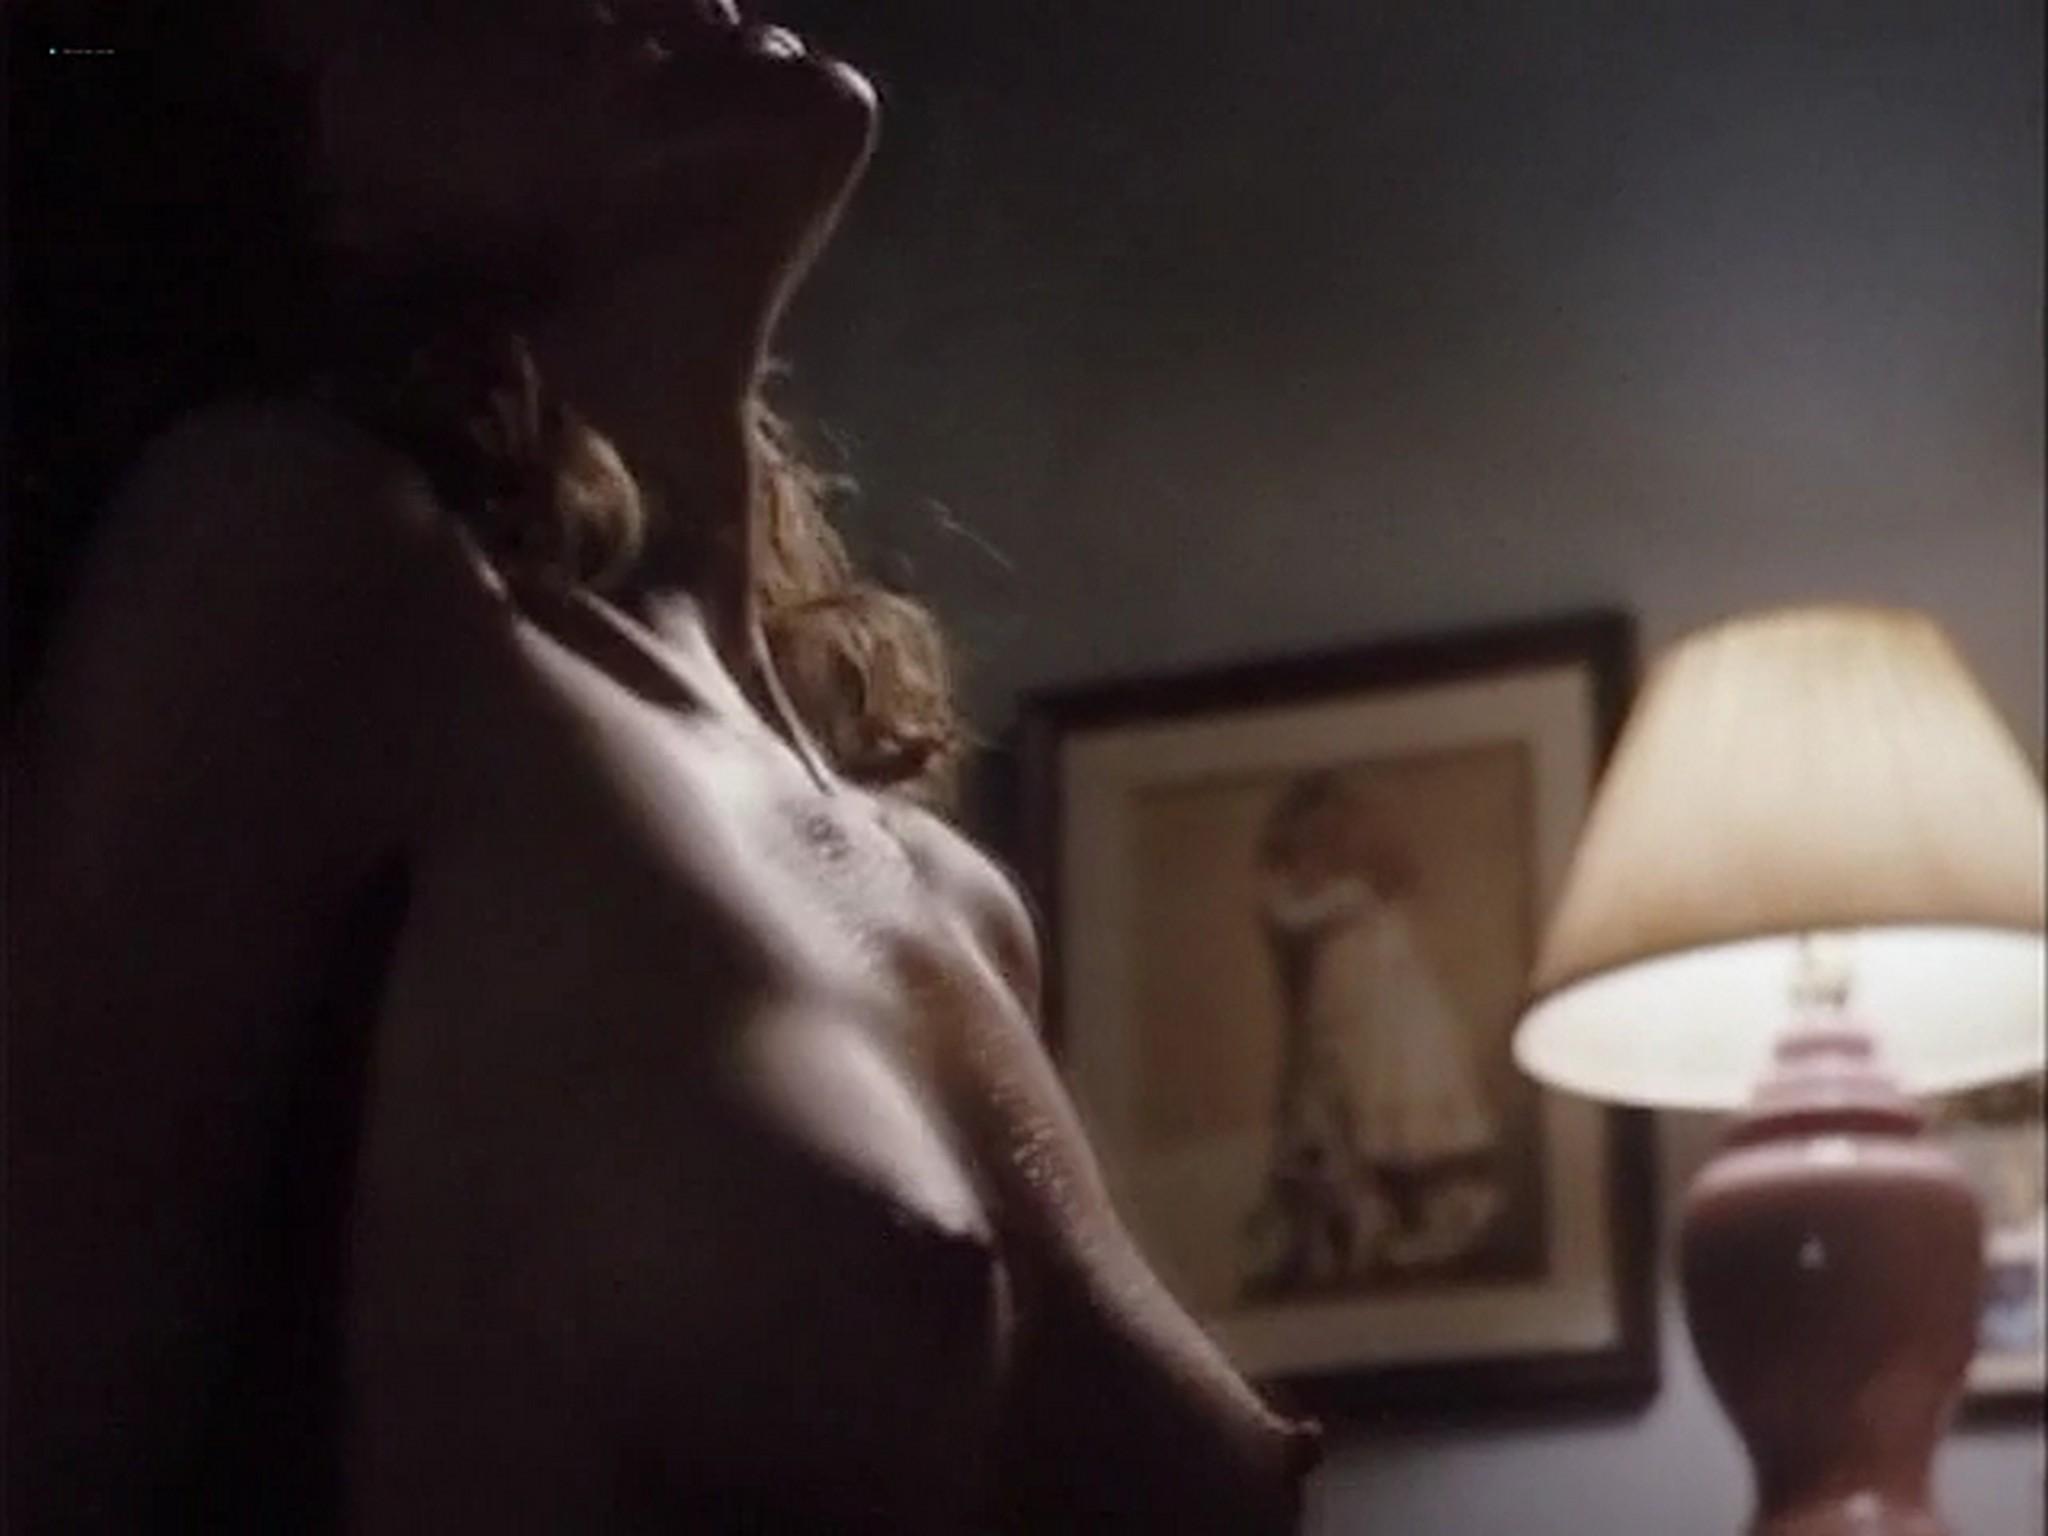 Barbara Alyn Woods nude Catya Sassoon Jill Pierce nude too as strippers Dance with Death 1991 19